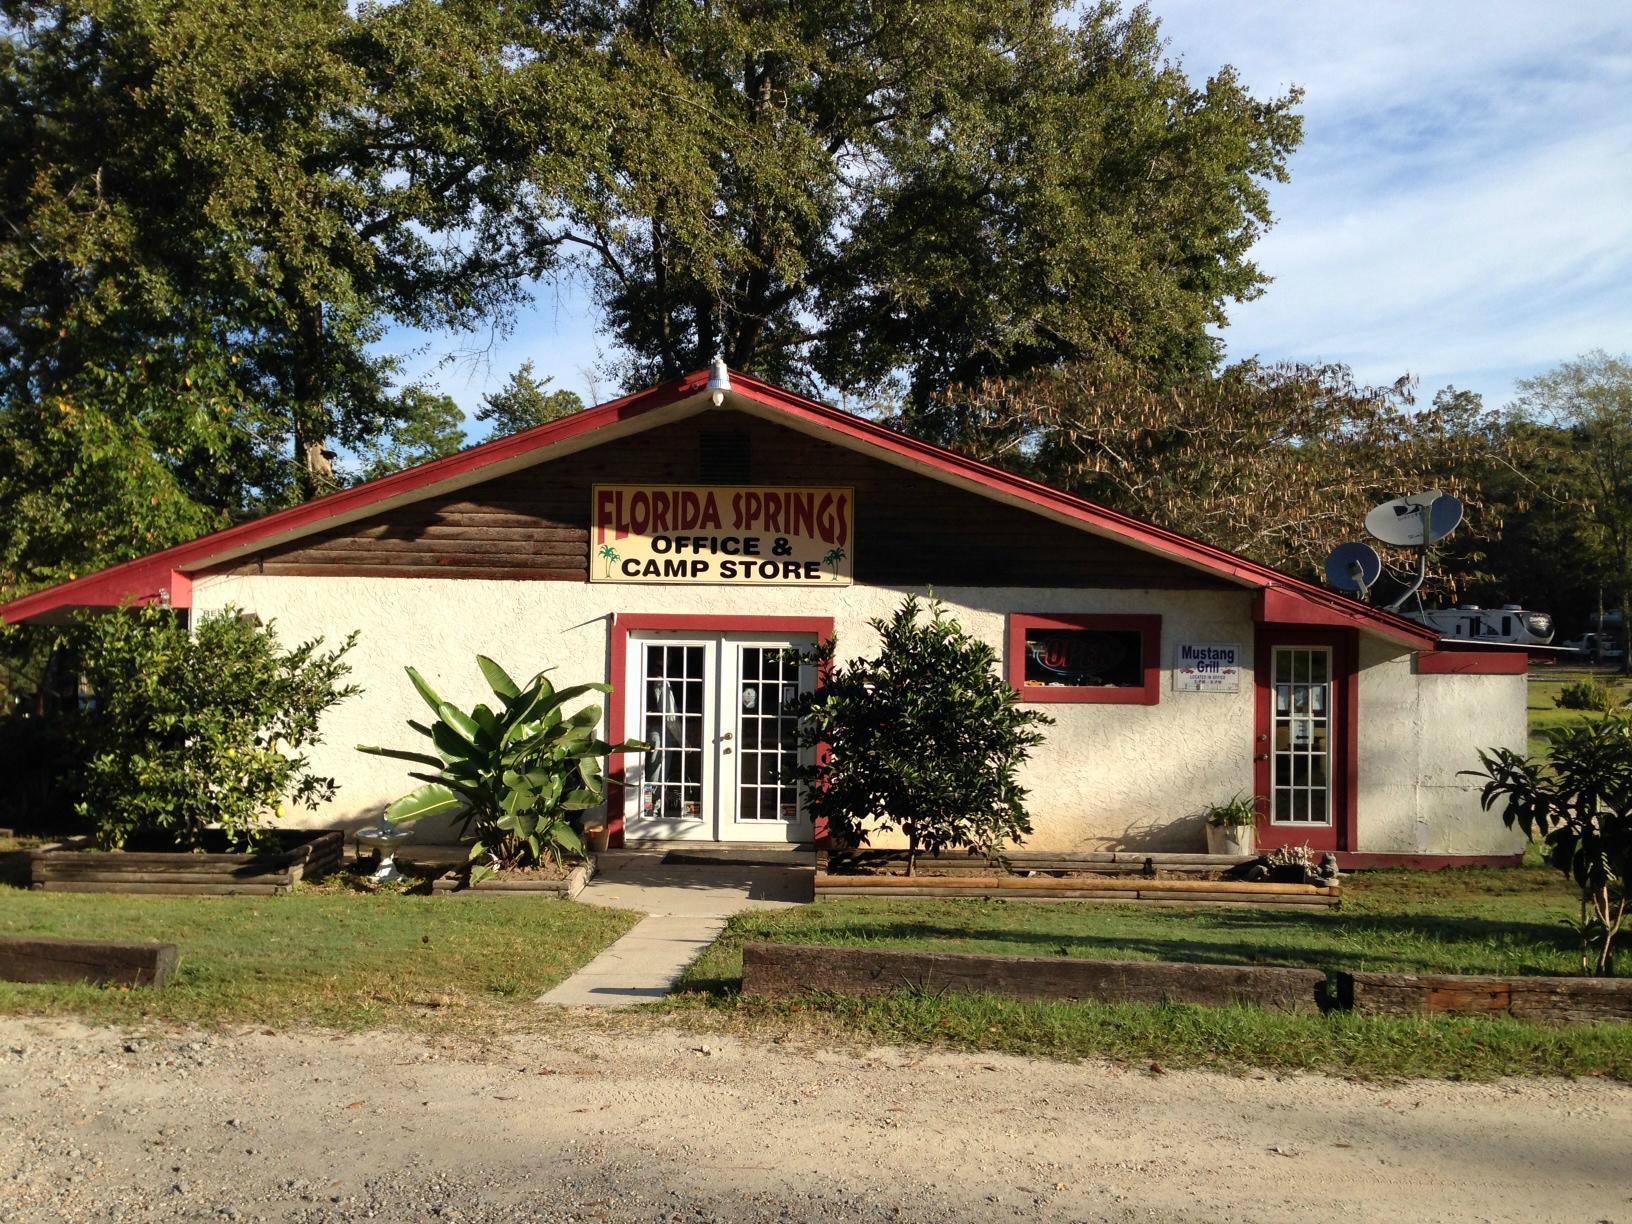 Florida Springs RV Resort and Campground